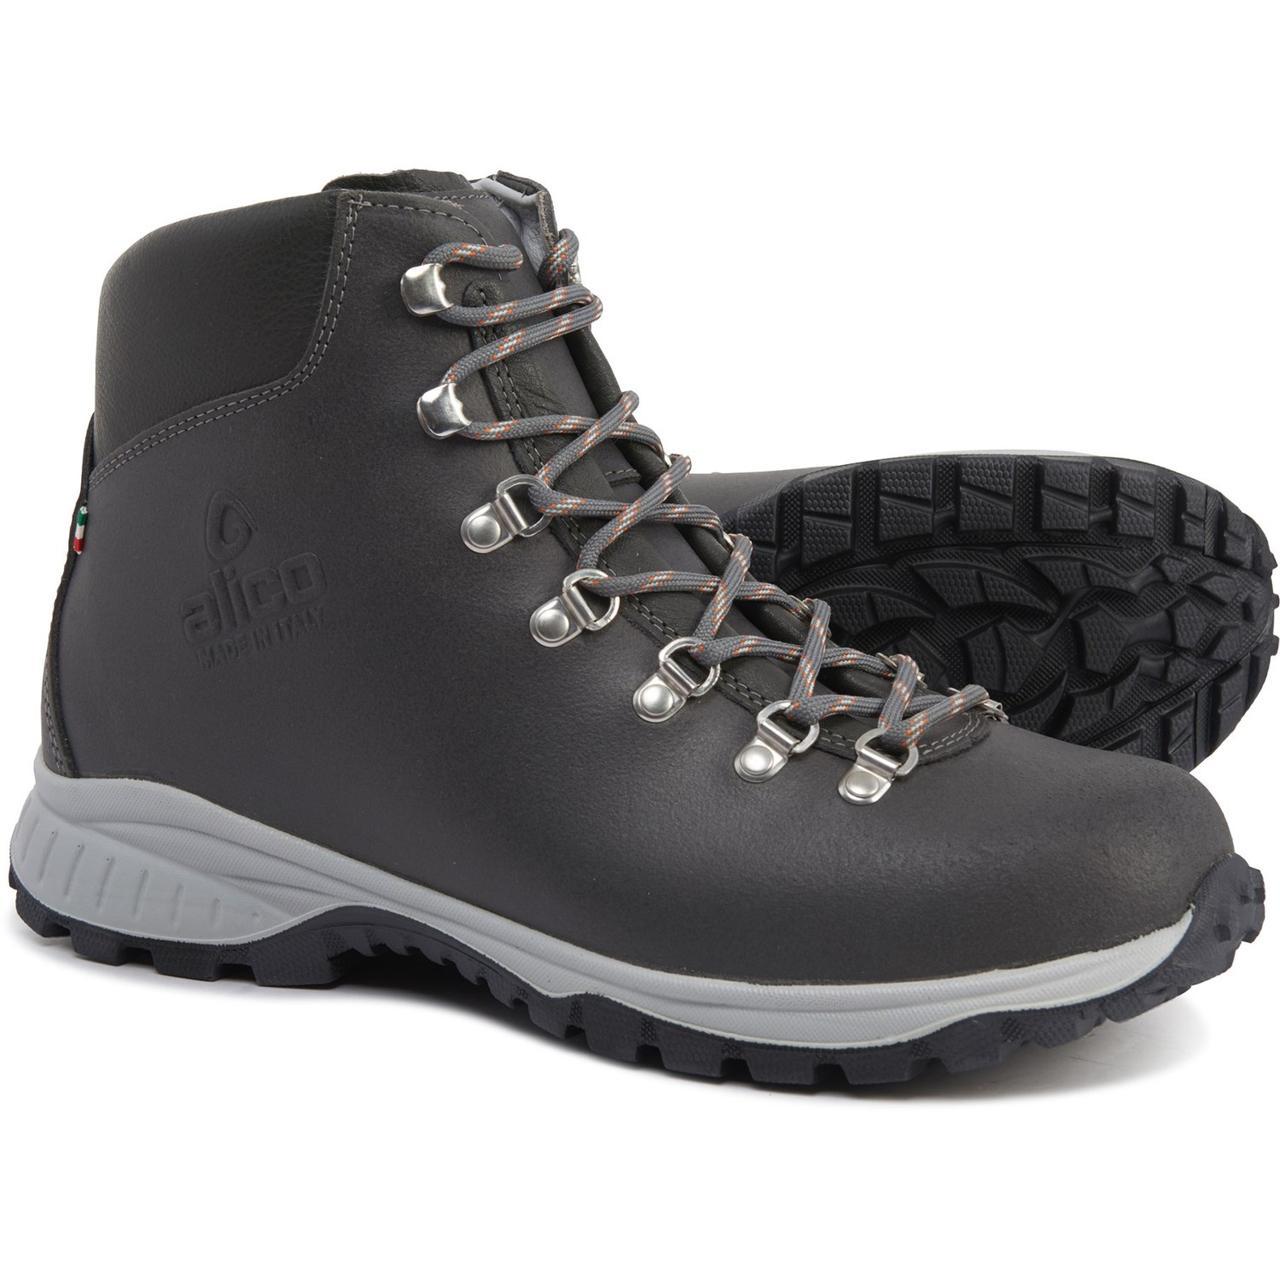 Ботинки трекинговые Alico Sherpa (Код ASHPG-45)